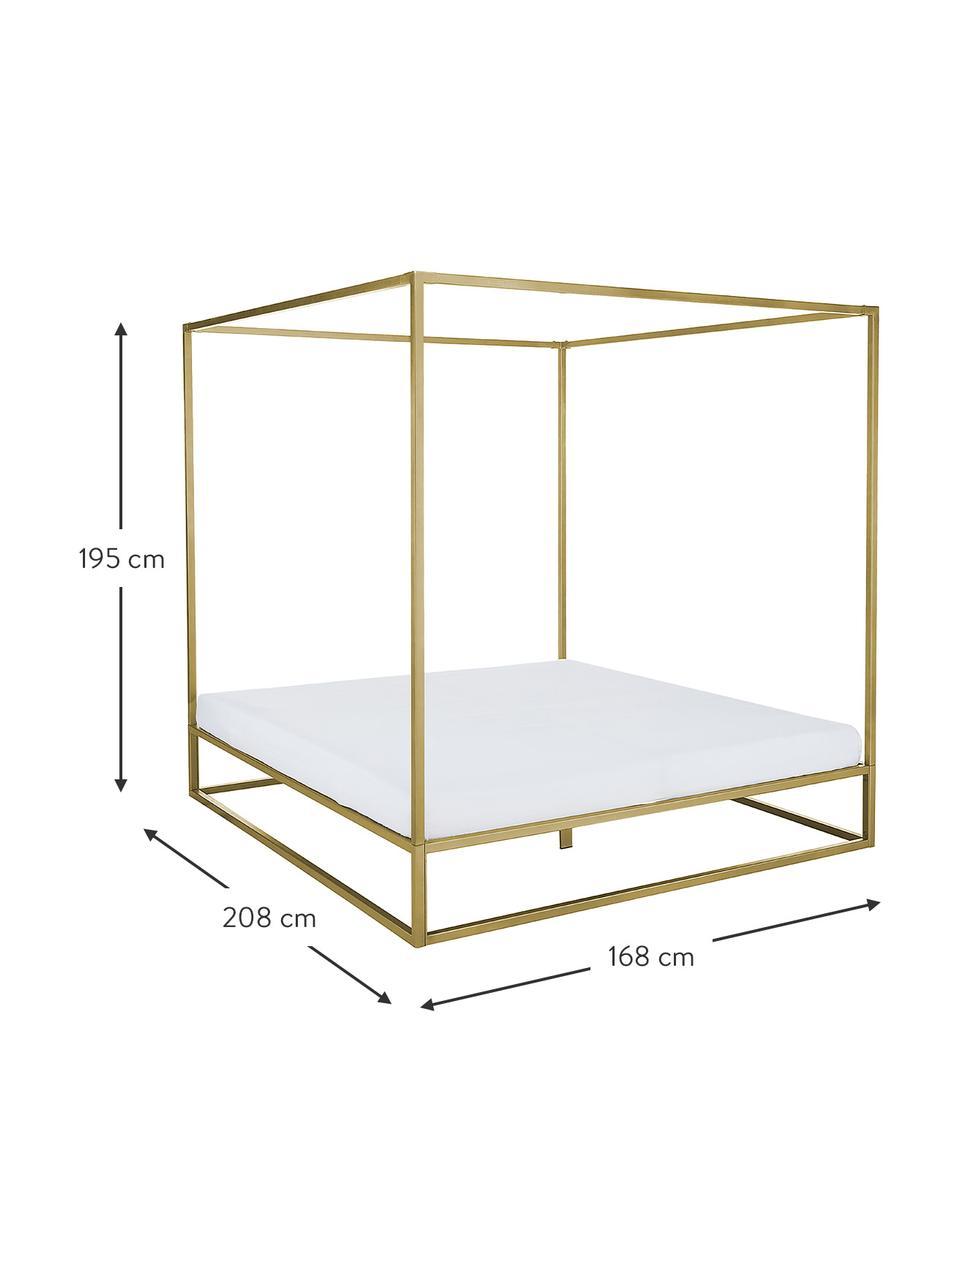 Letto a baldacchino in metallo Belle, Metallo ottonato, Dorato opaco, 160 x 200 cm